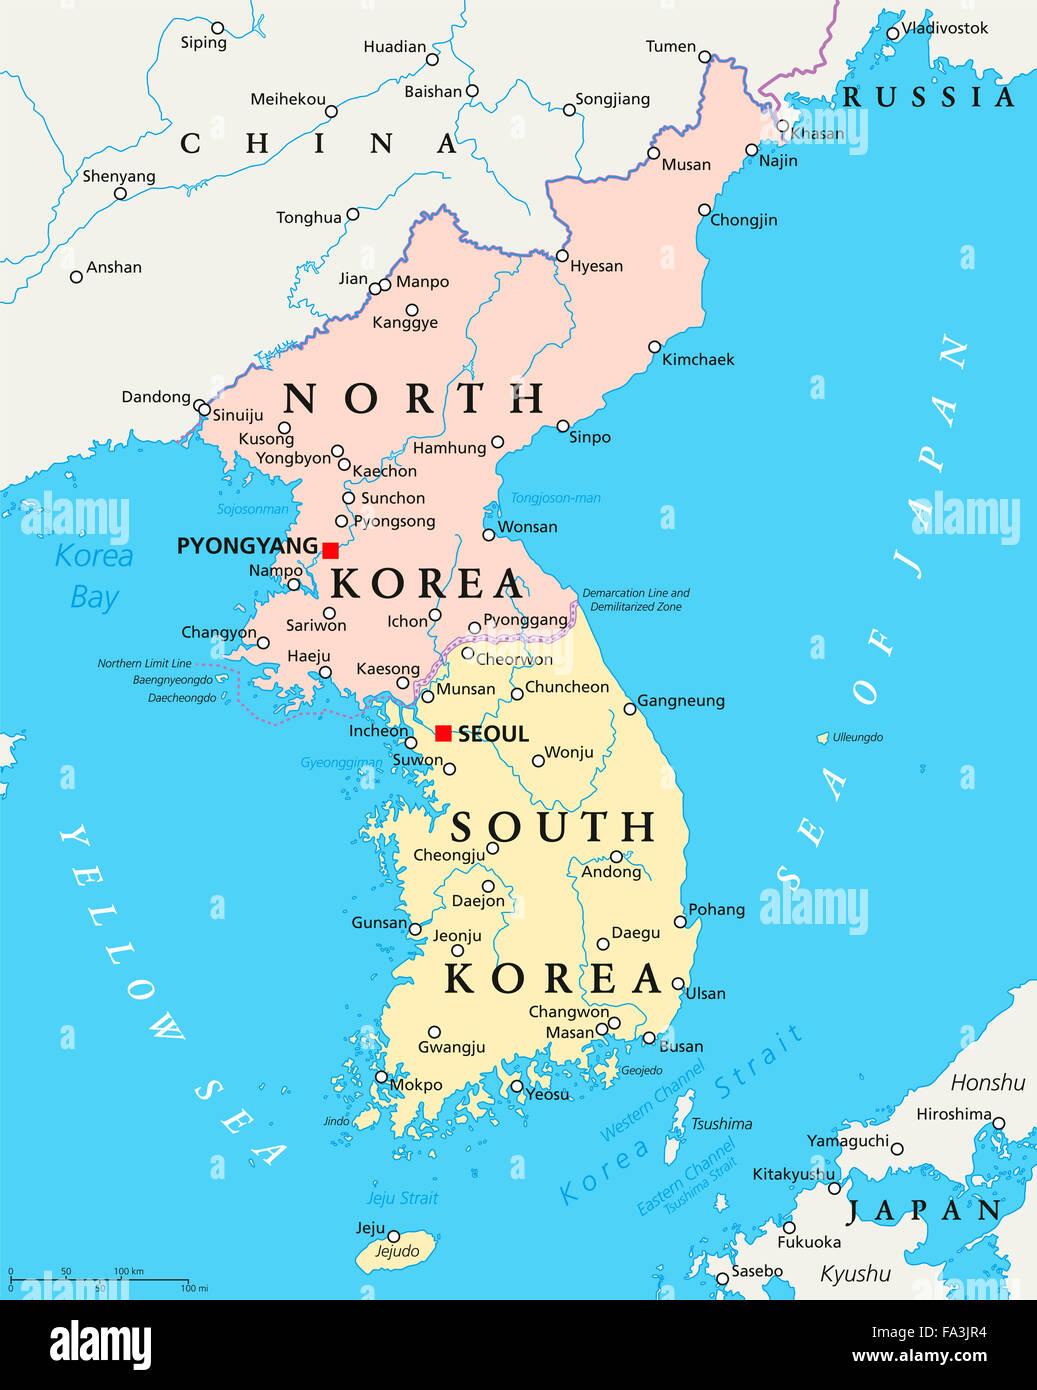 North Korea South Korea Political Map With Capitals